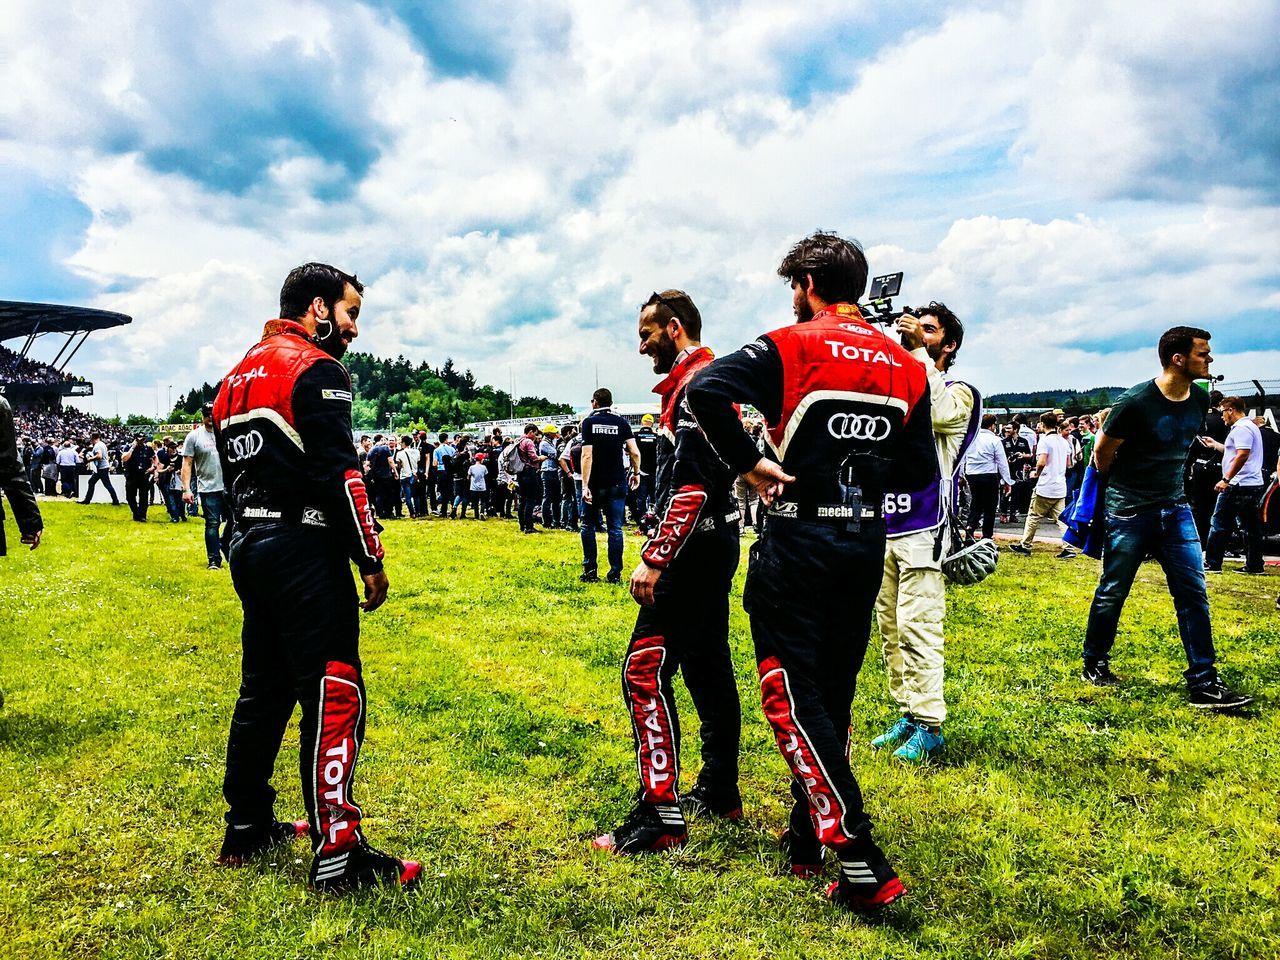 Motorsport Racing Race 24h Race Nurburgring Audi Total Nordschleife People Watching People Photography